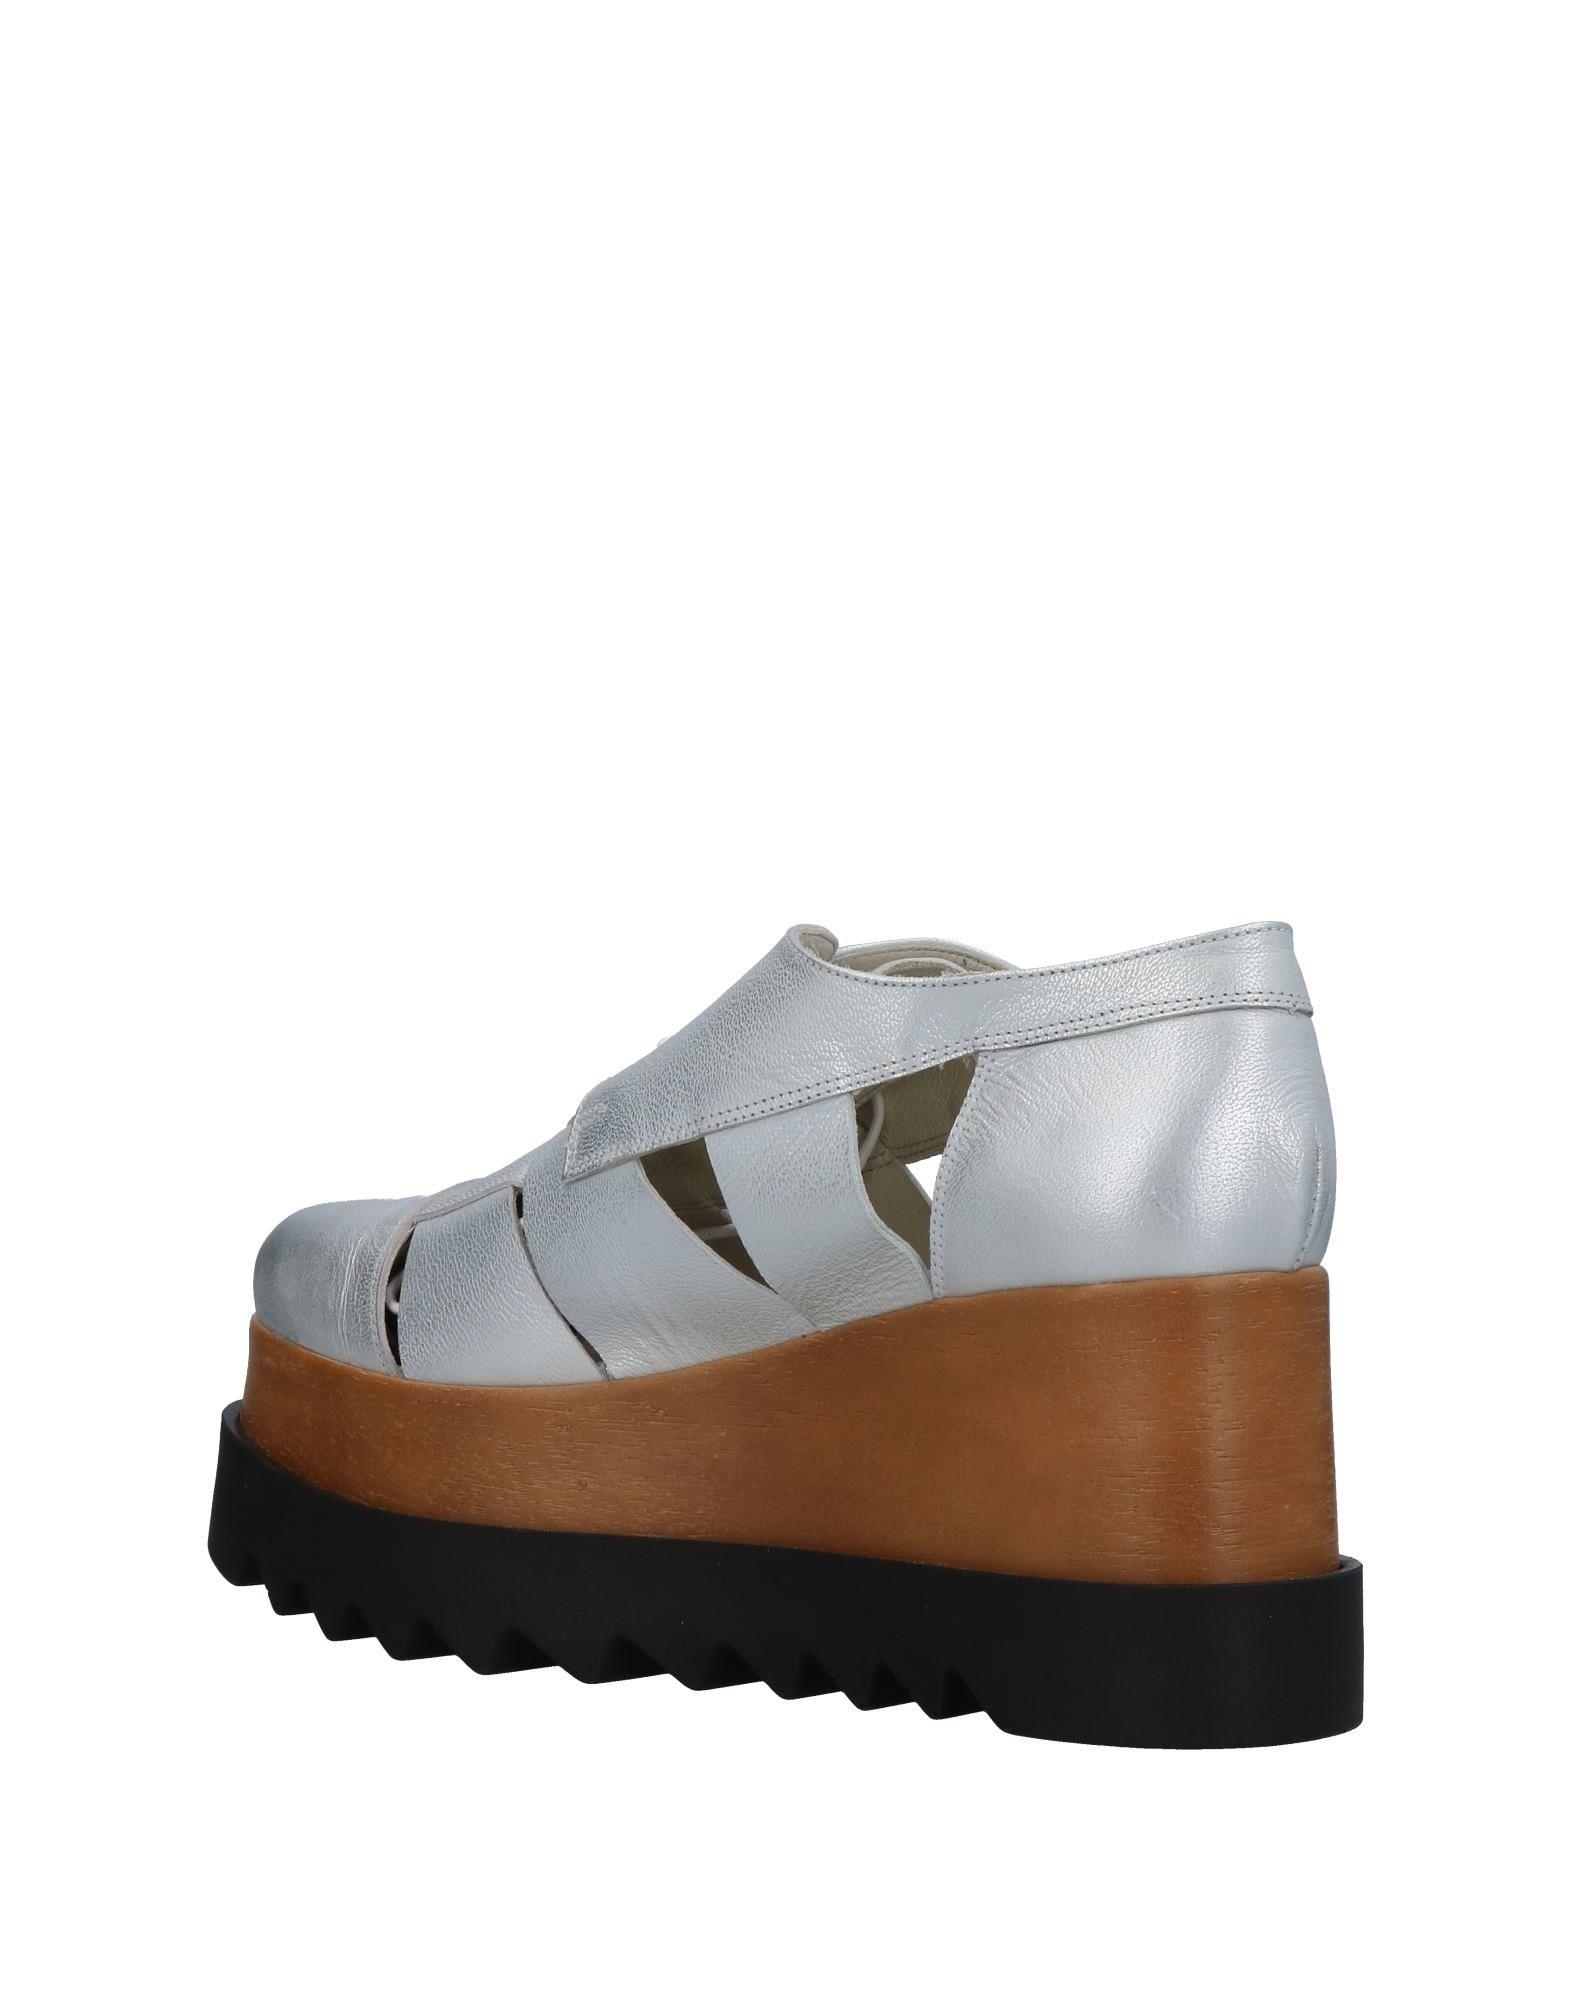 CHAUSSURES - Chaussures à lacetsLe Stelle zM0vBW47Xc